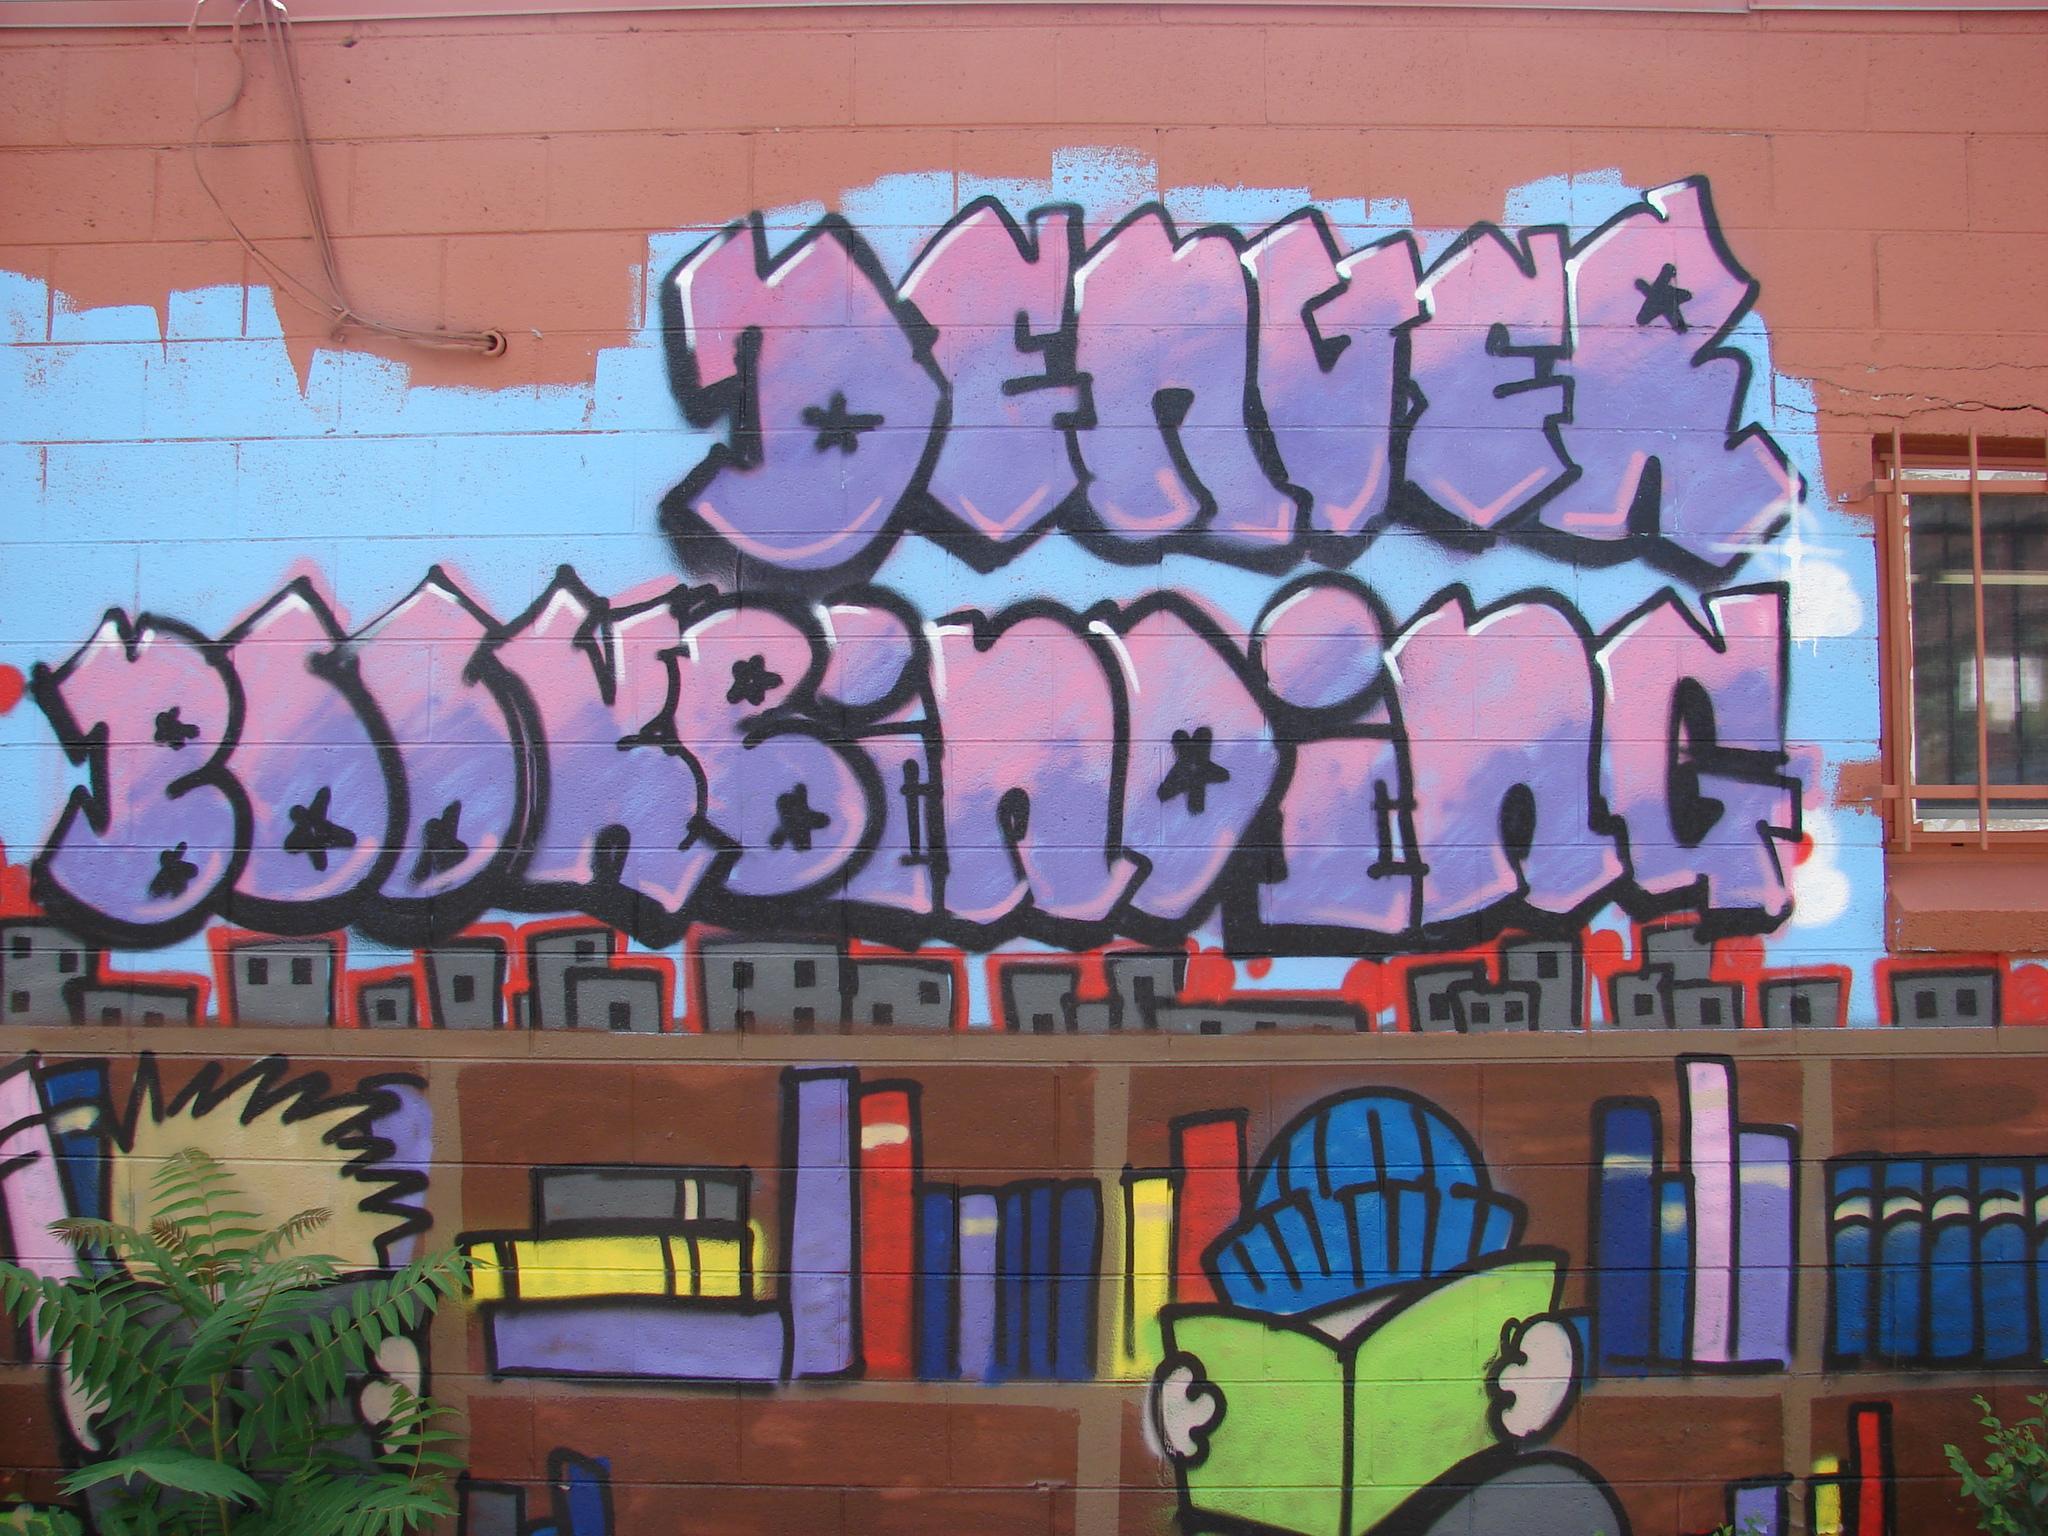 Graffiti art diy - Sample Of The Graffiti Art The Embellishes The Denver Bookbinding Company